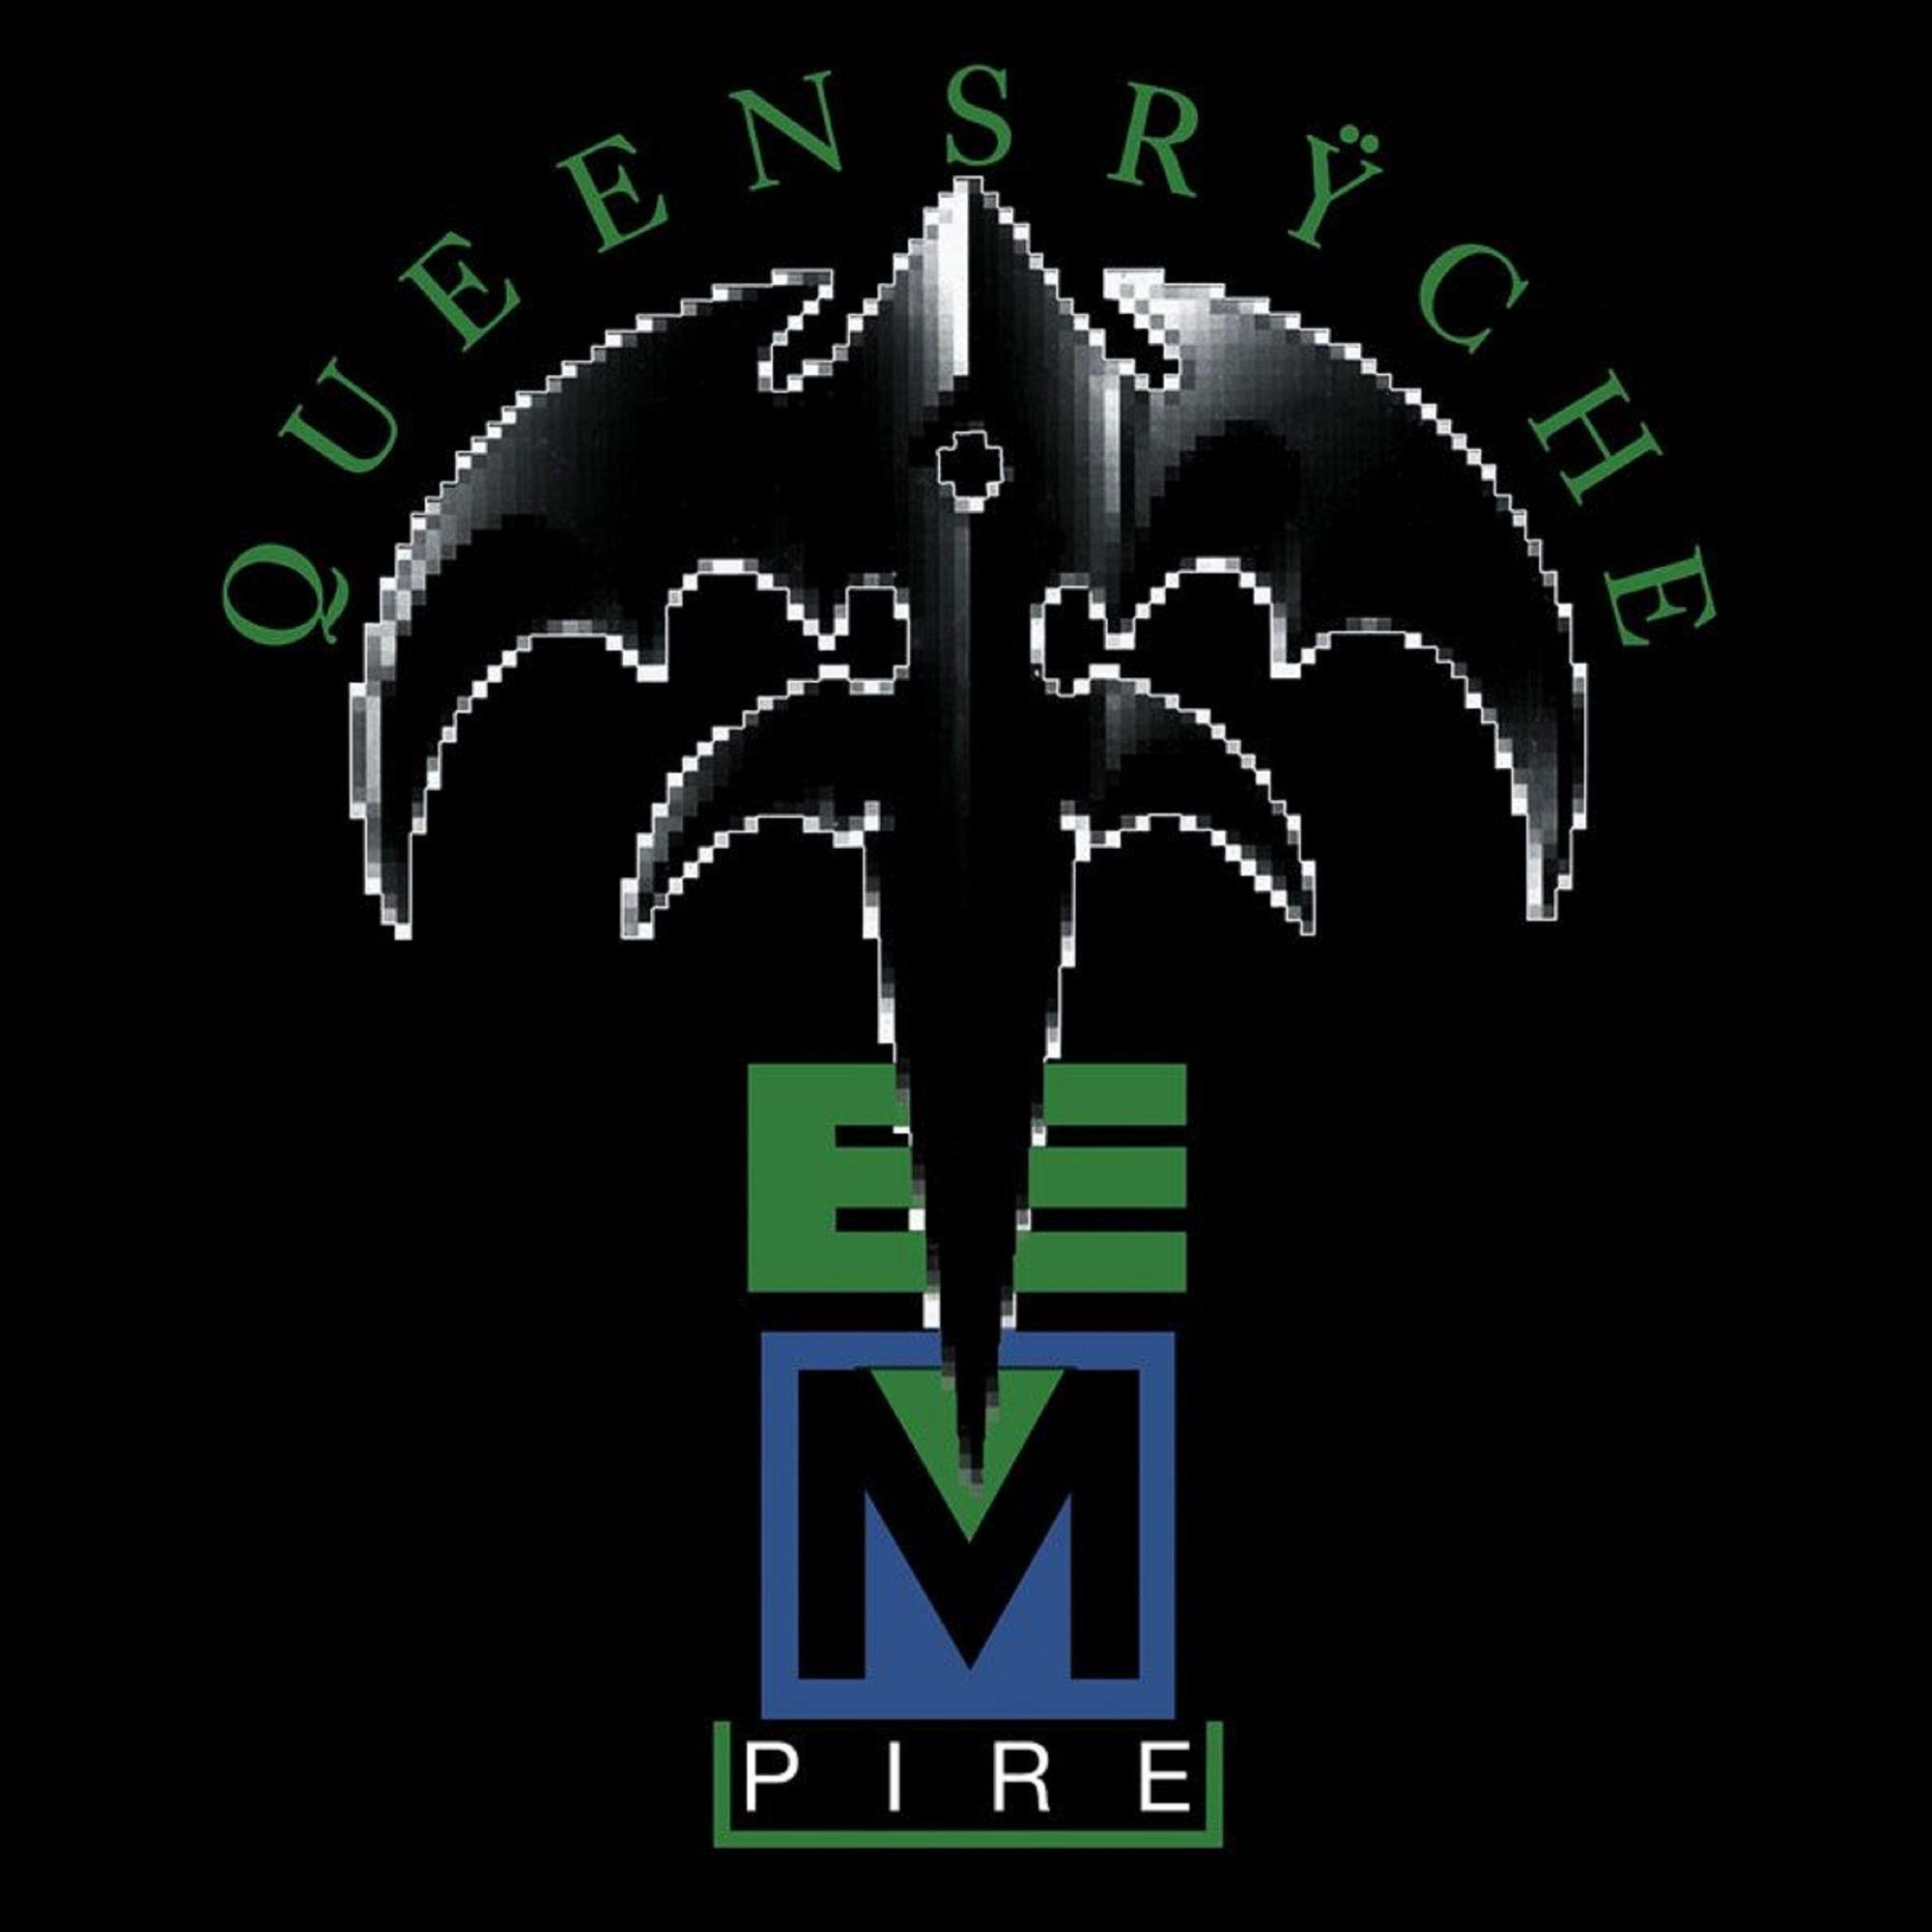 Vinilo : Queensrÿche - Empire (180 Gram Vinyl, Gatefold LP Jacket, Limited Edition, Audiophile, Anniversary Edition)